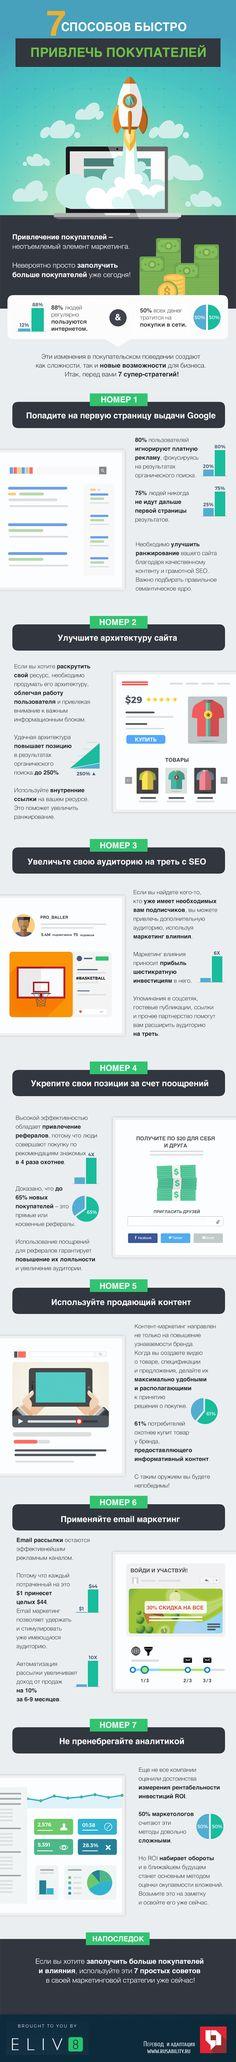 маркетинг, инфографика, контент-маркетинг, стратегия, советы, seo, sem, маркетинг влияния, реферал, email маркетинг, ROI, аналитика